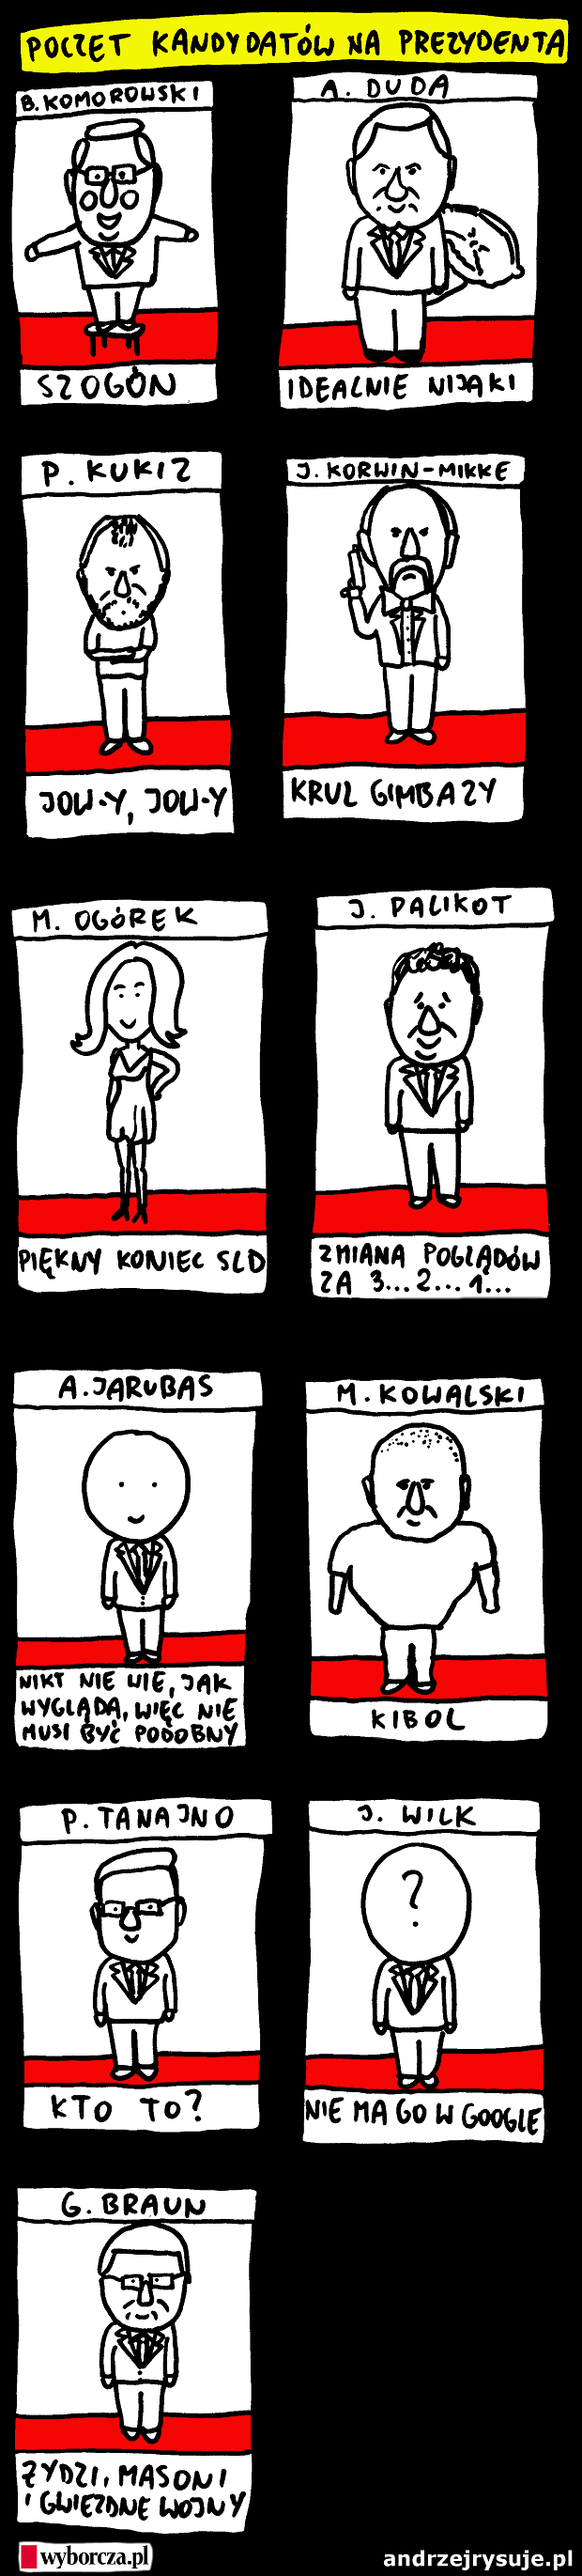 poczet kandydatow